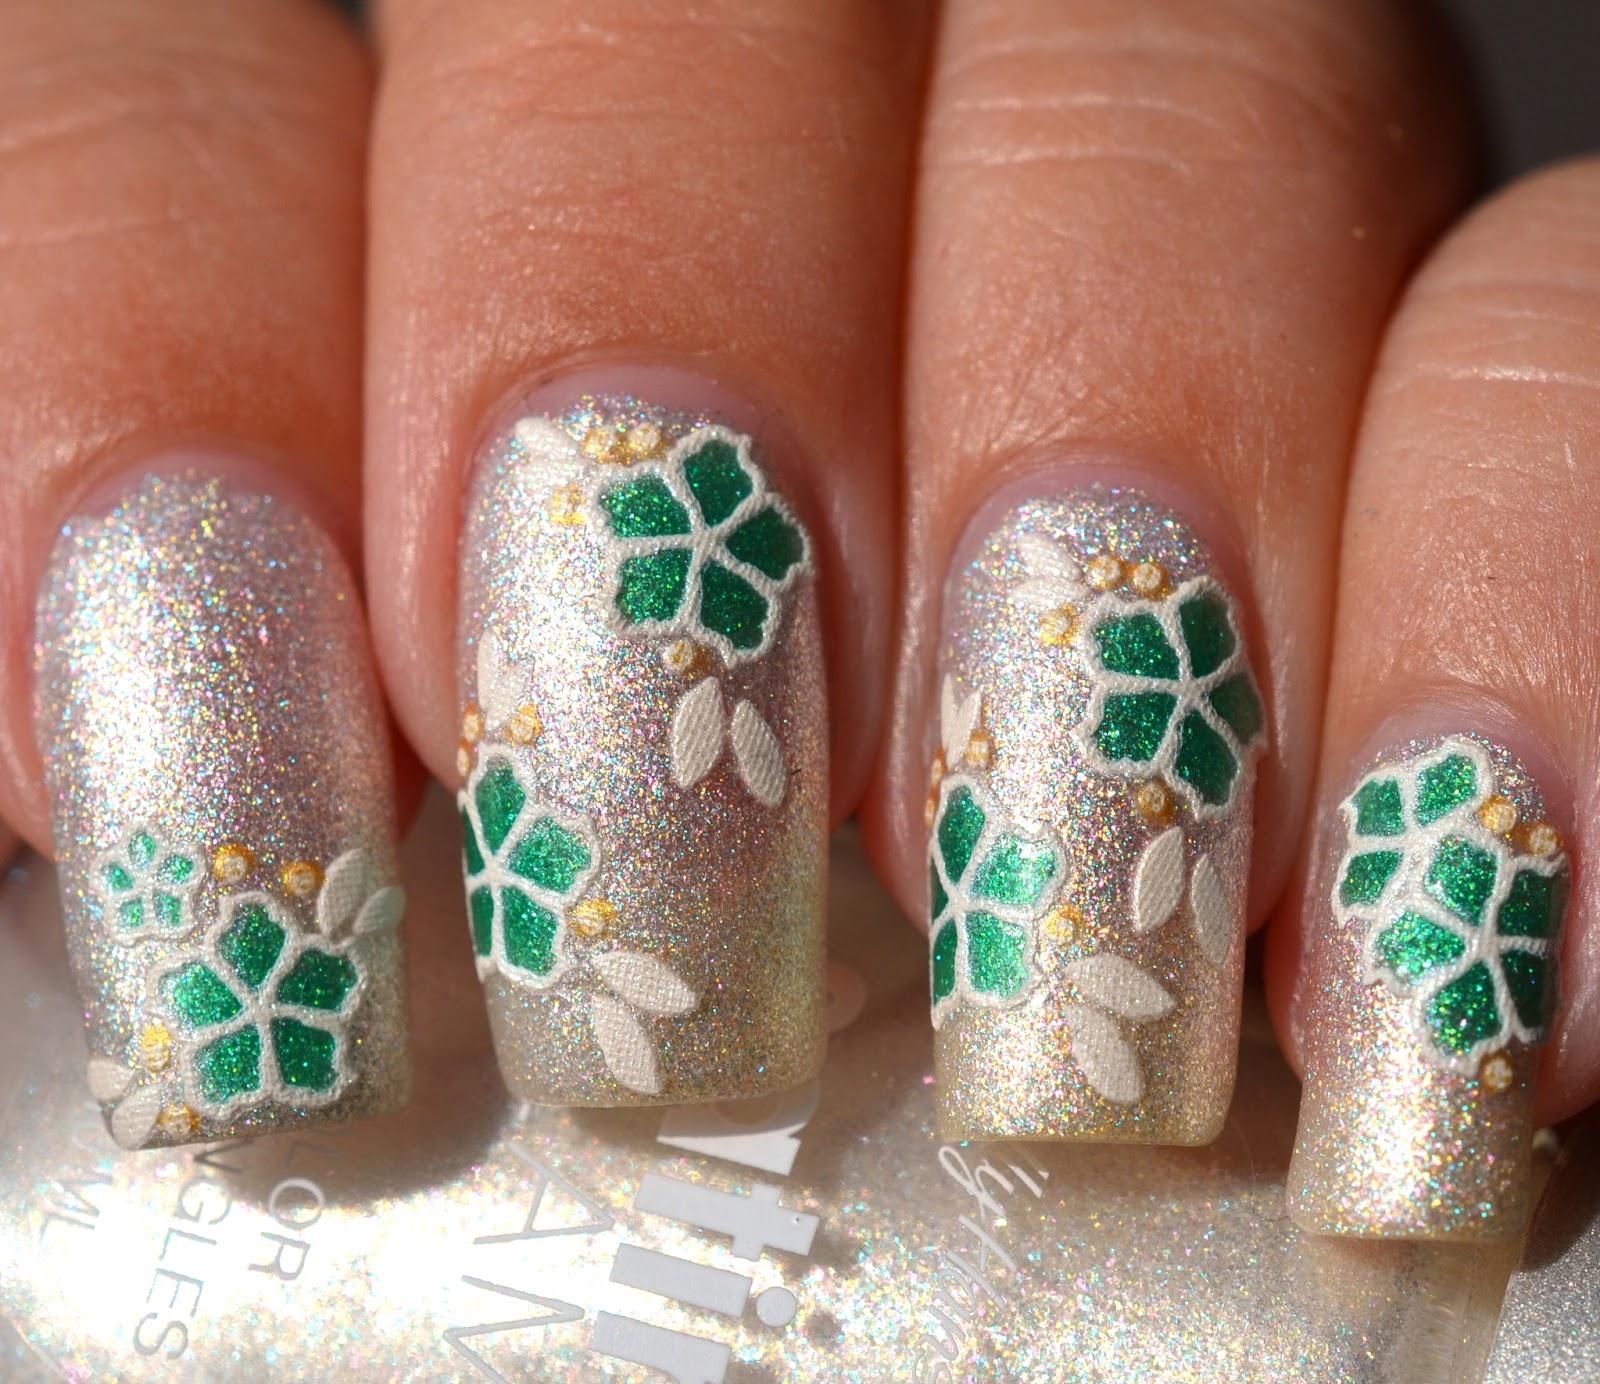 http://lenas-sofa.blogspot.de/2014/06/sally-hansen-satin-glam-02-crystalline.html